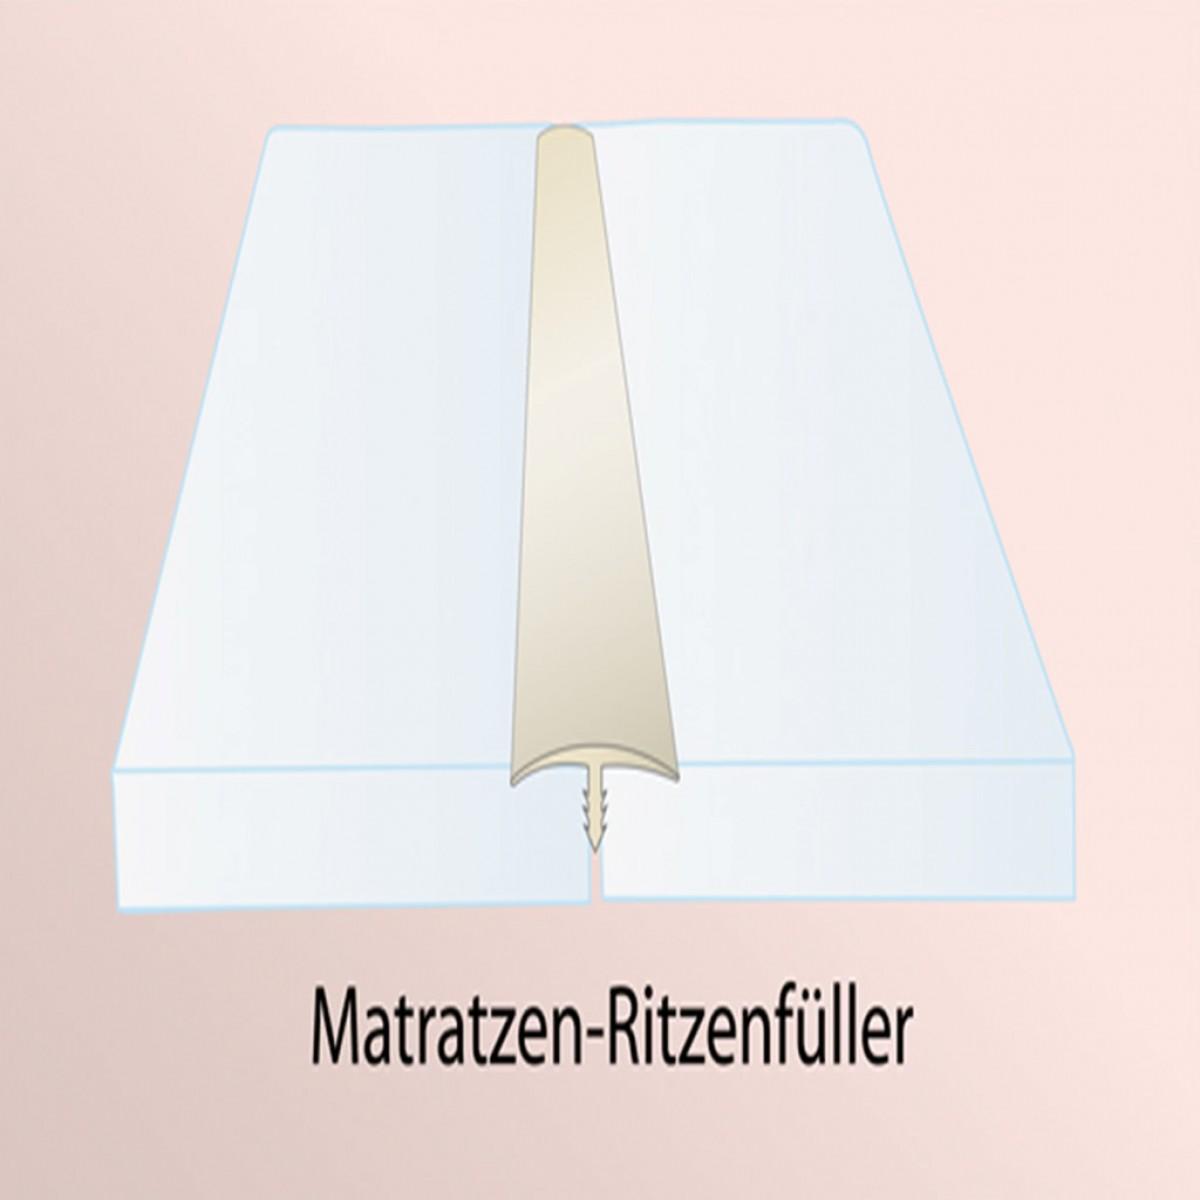 Dormando Matratzen-Ritzenfüller Liebesbrücke Schema